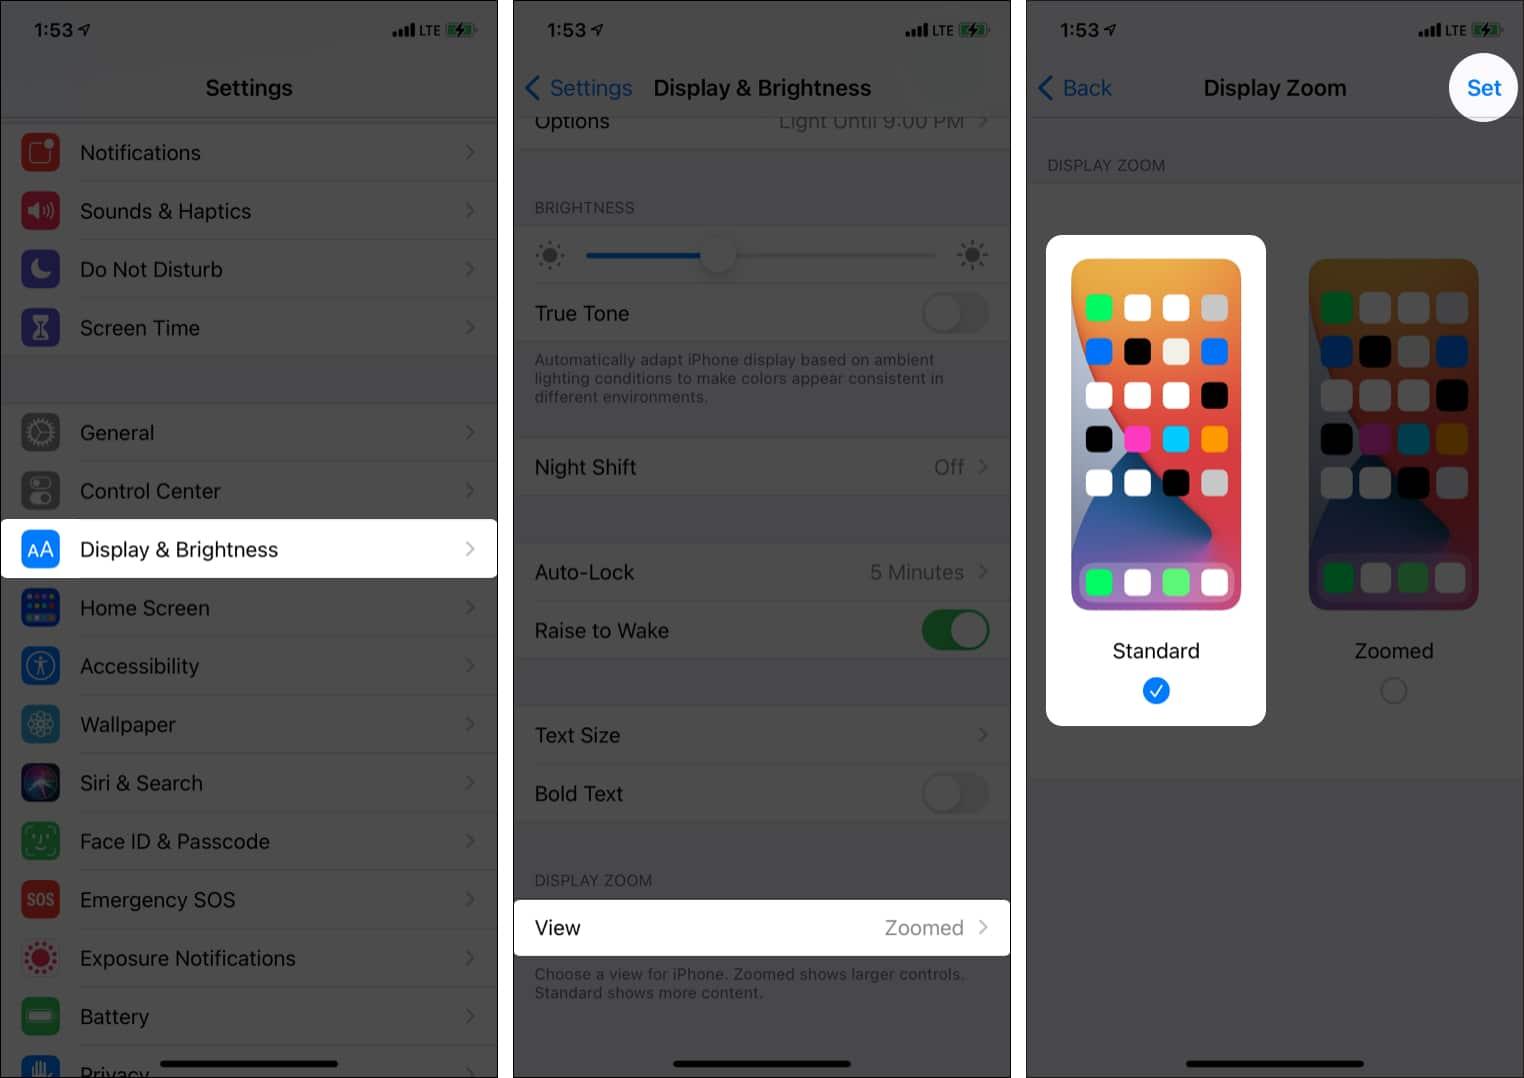 Turn off iPhone display zoom view